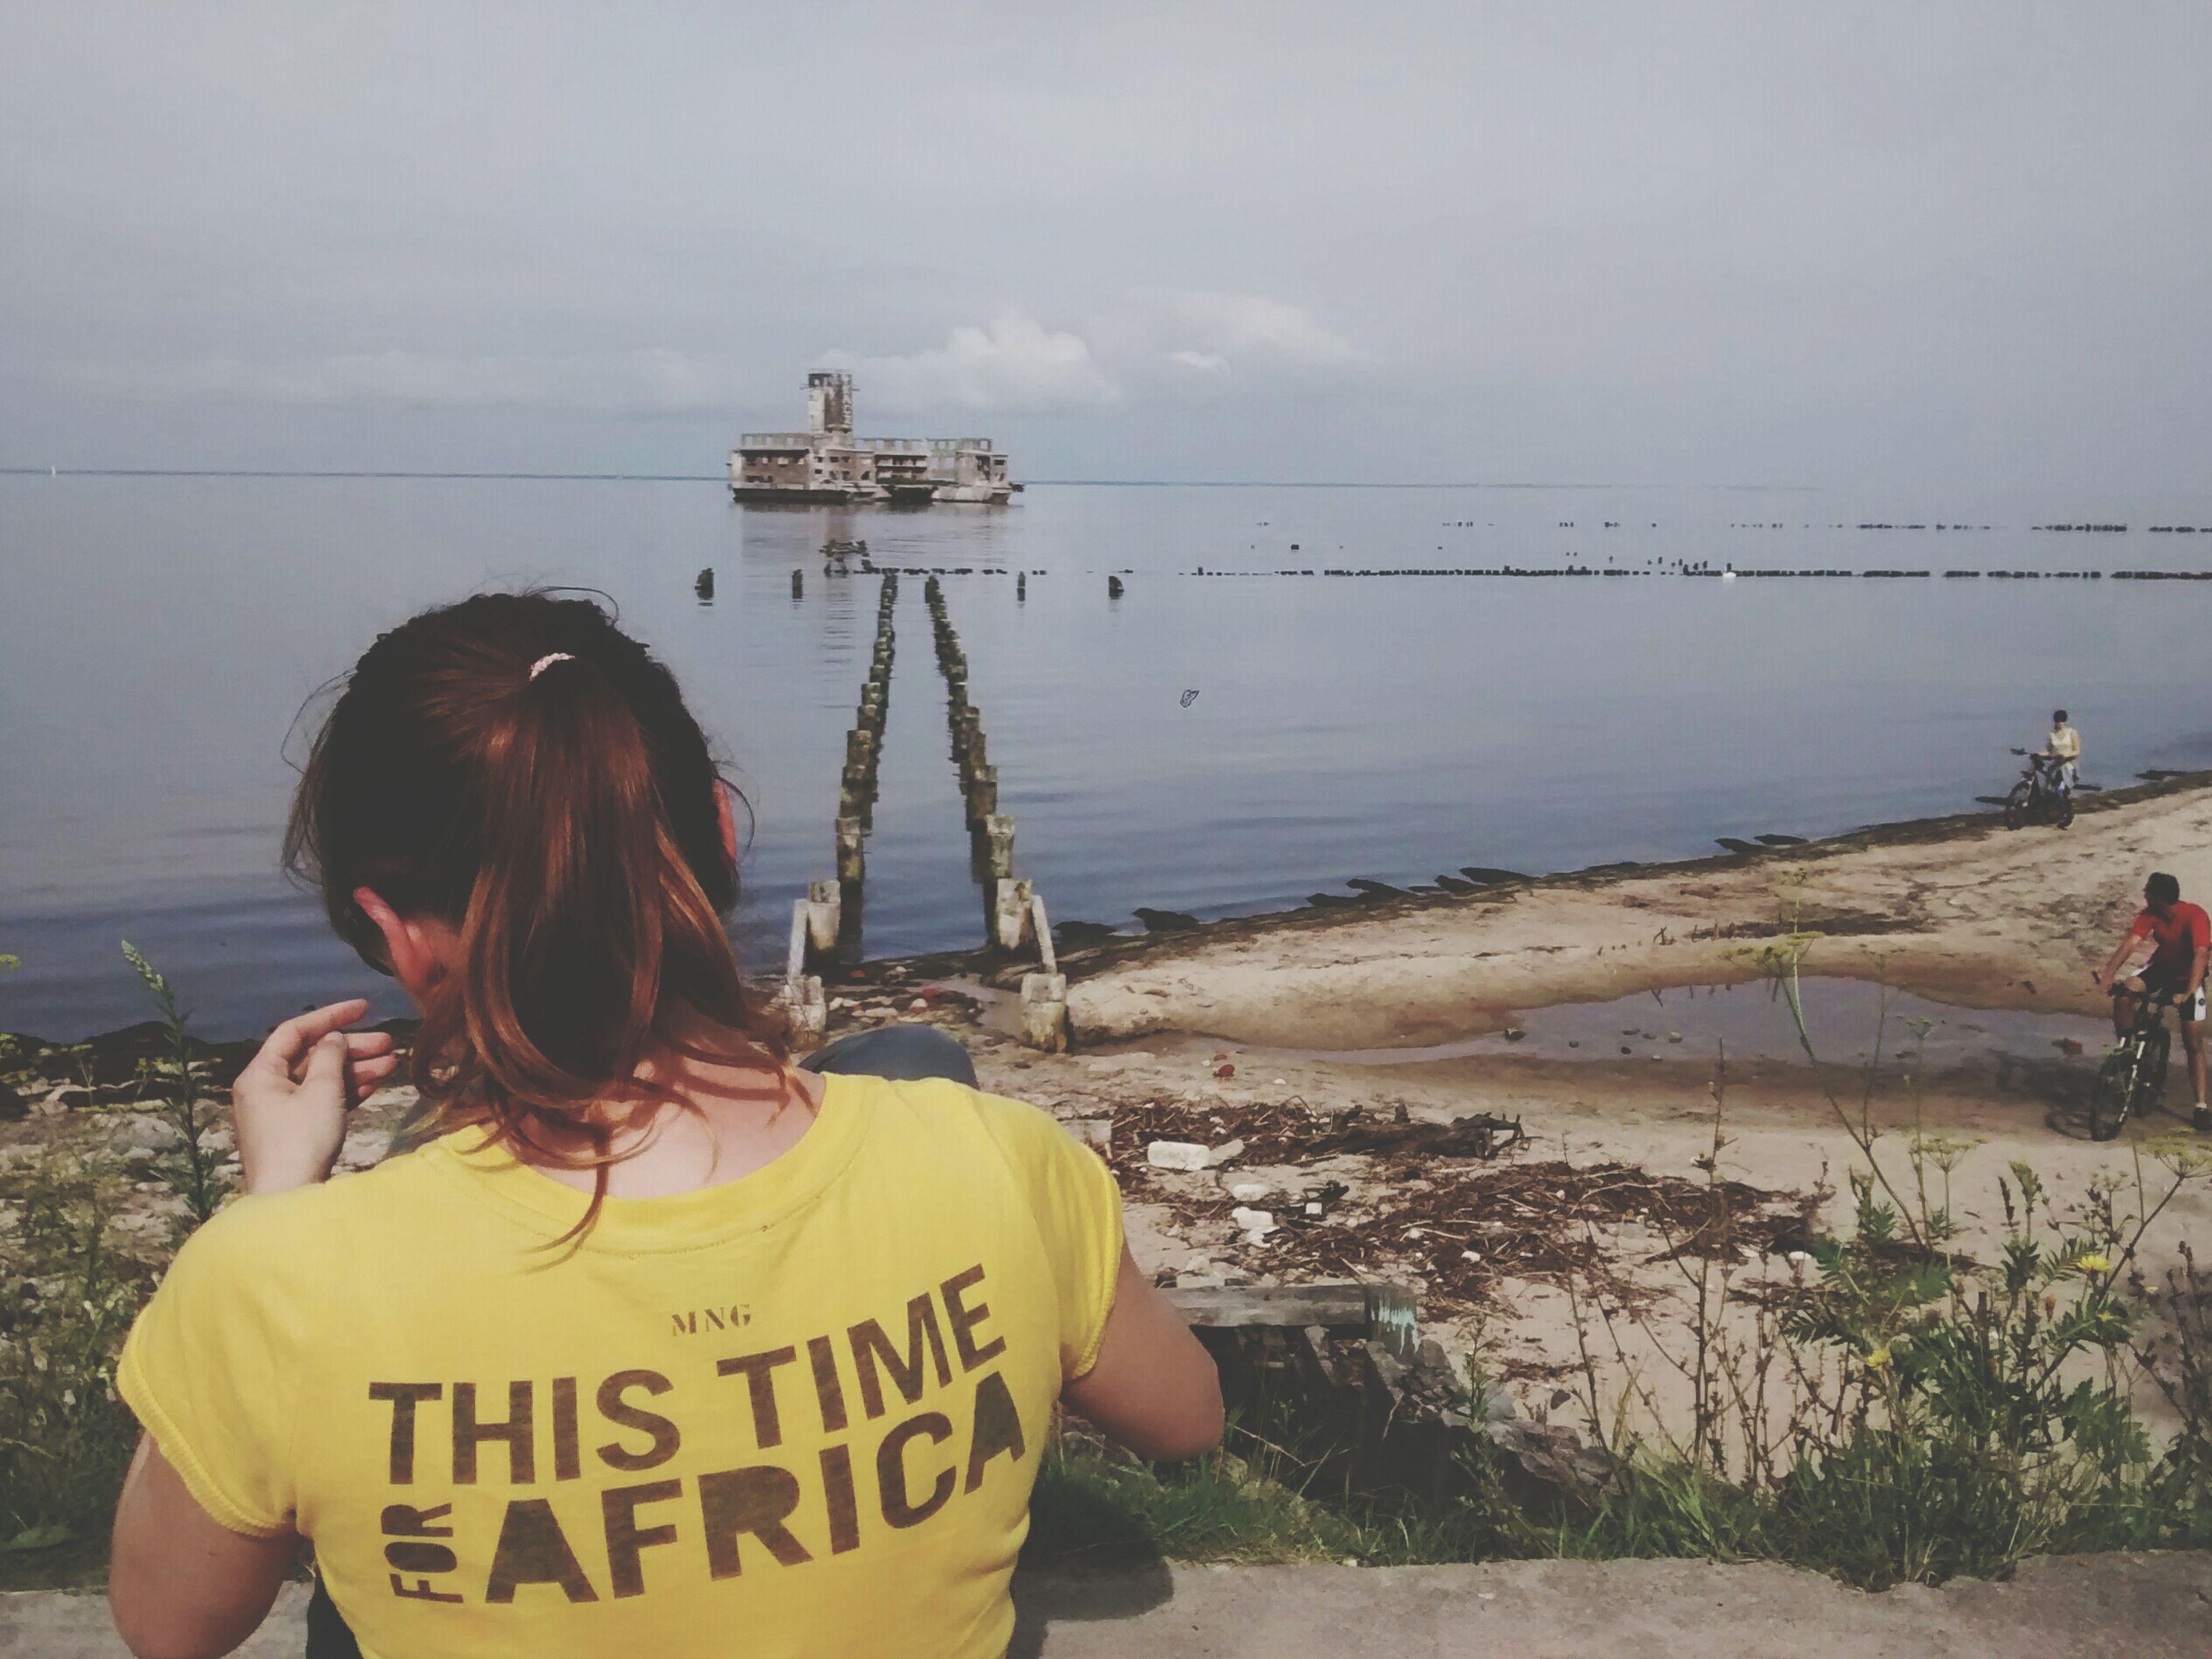 Taking Photos Enjoying Life Sea And Sky Yellow Beach Torpedo Platform Girl Summertime Hanging Out Alina